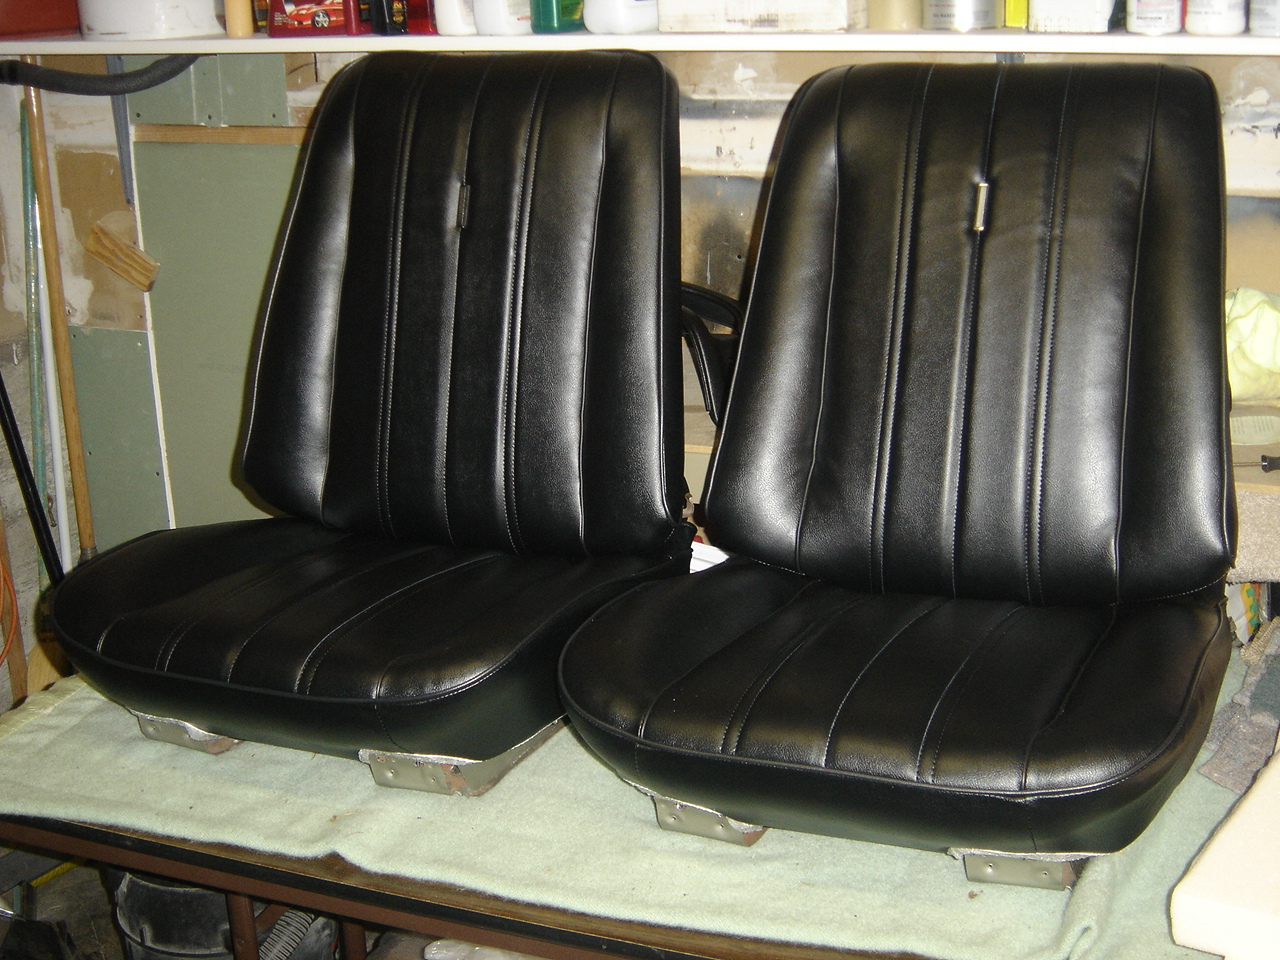 1966 Chevelle Bucket Seats & Rear Seat | Classic Seat